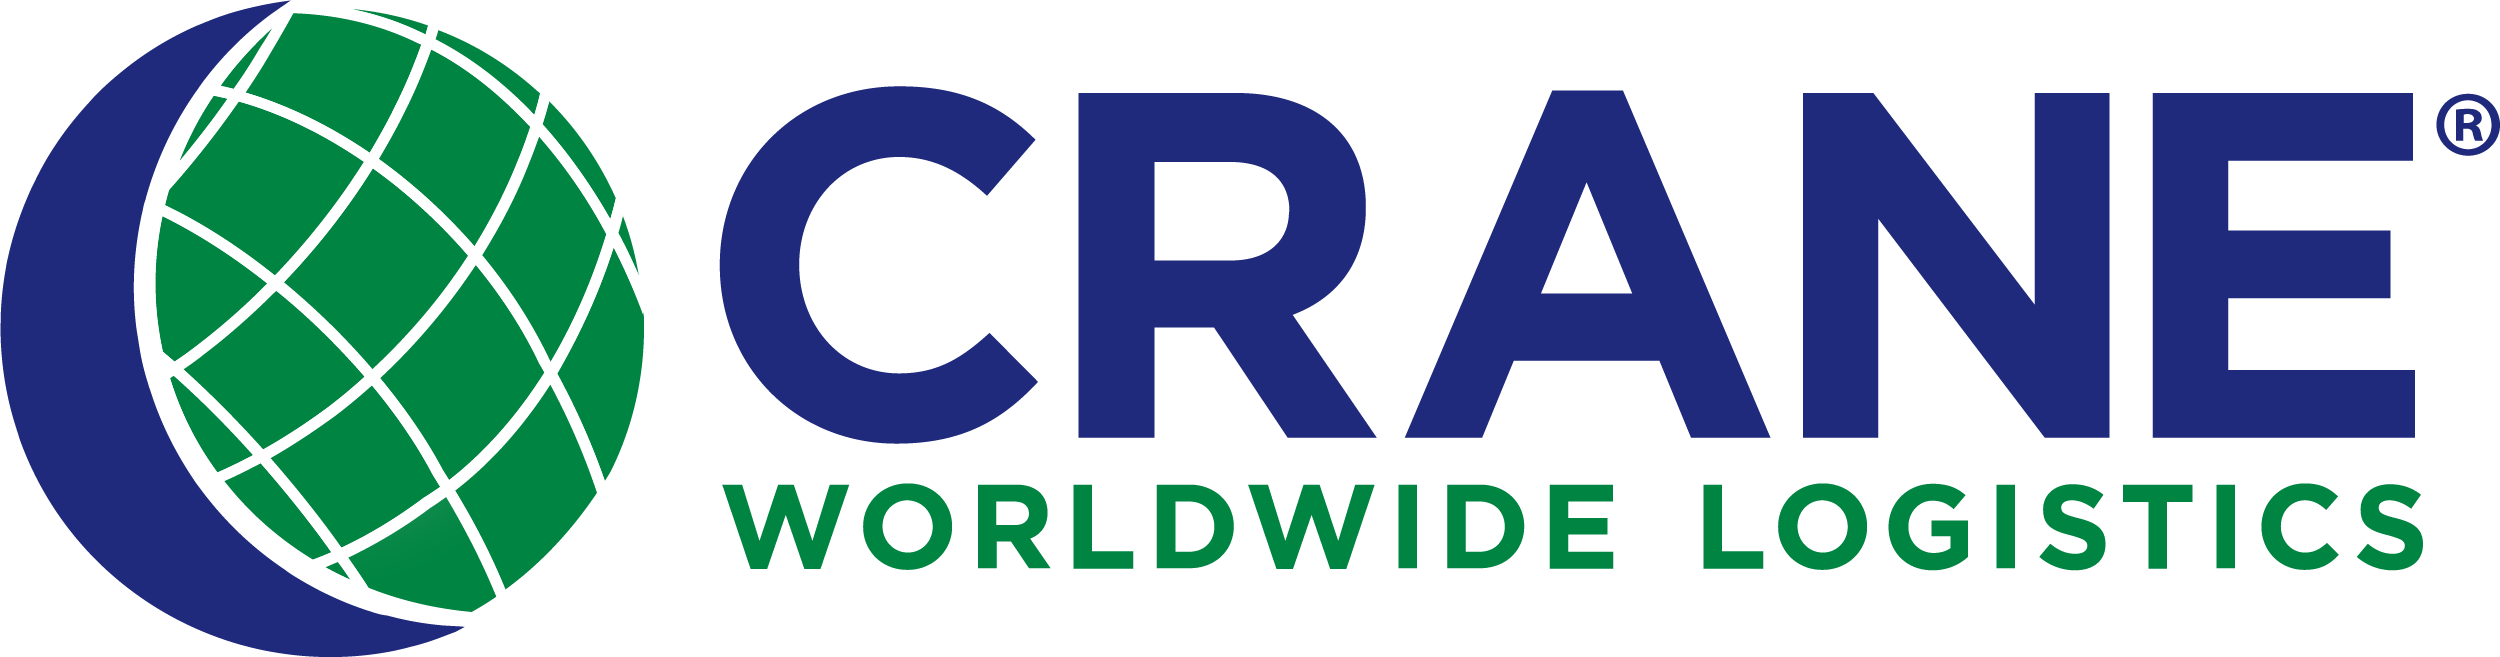 crane-worldwide-logistics-logo